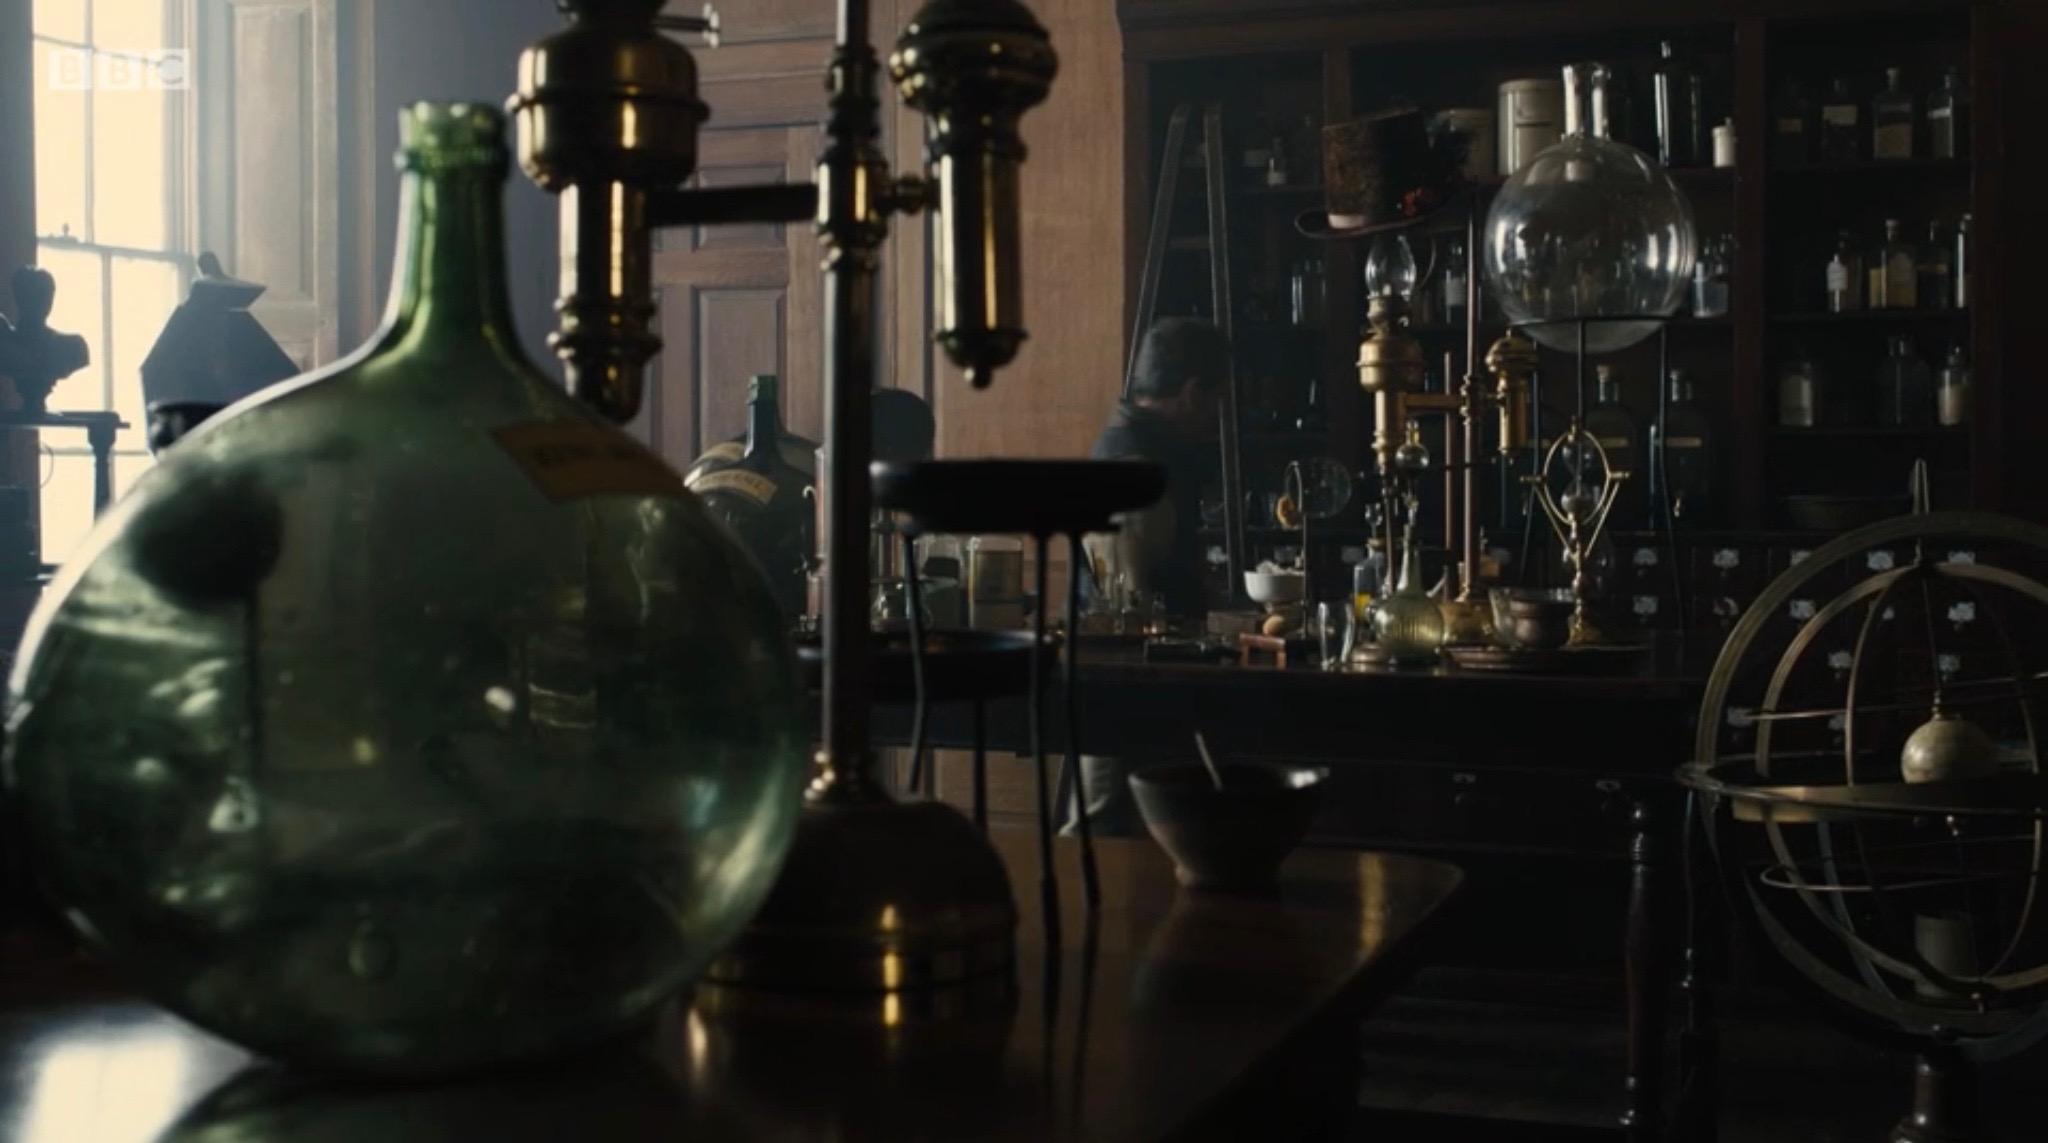 Cholmondeley's Lab